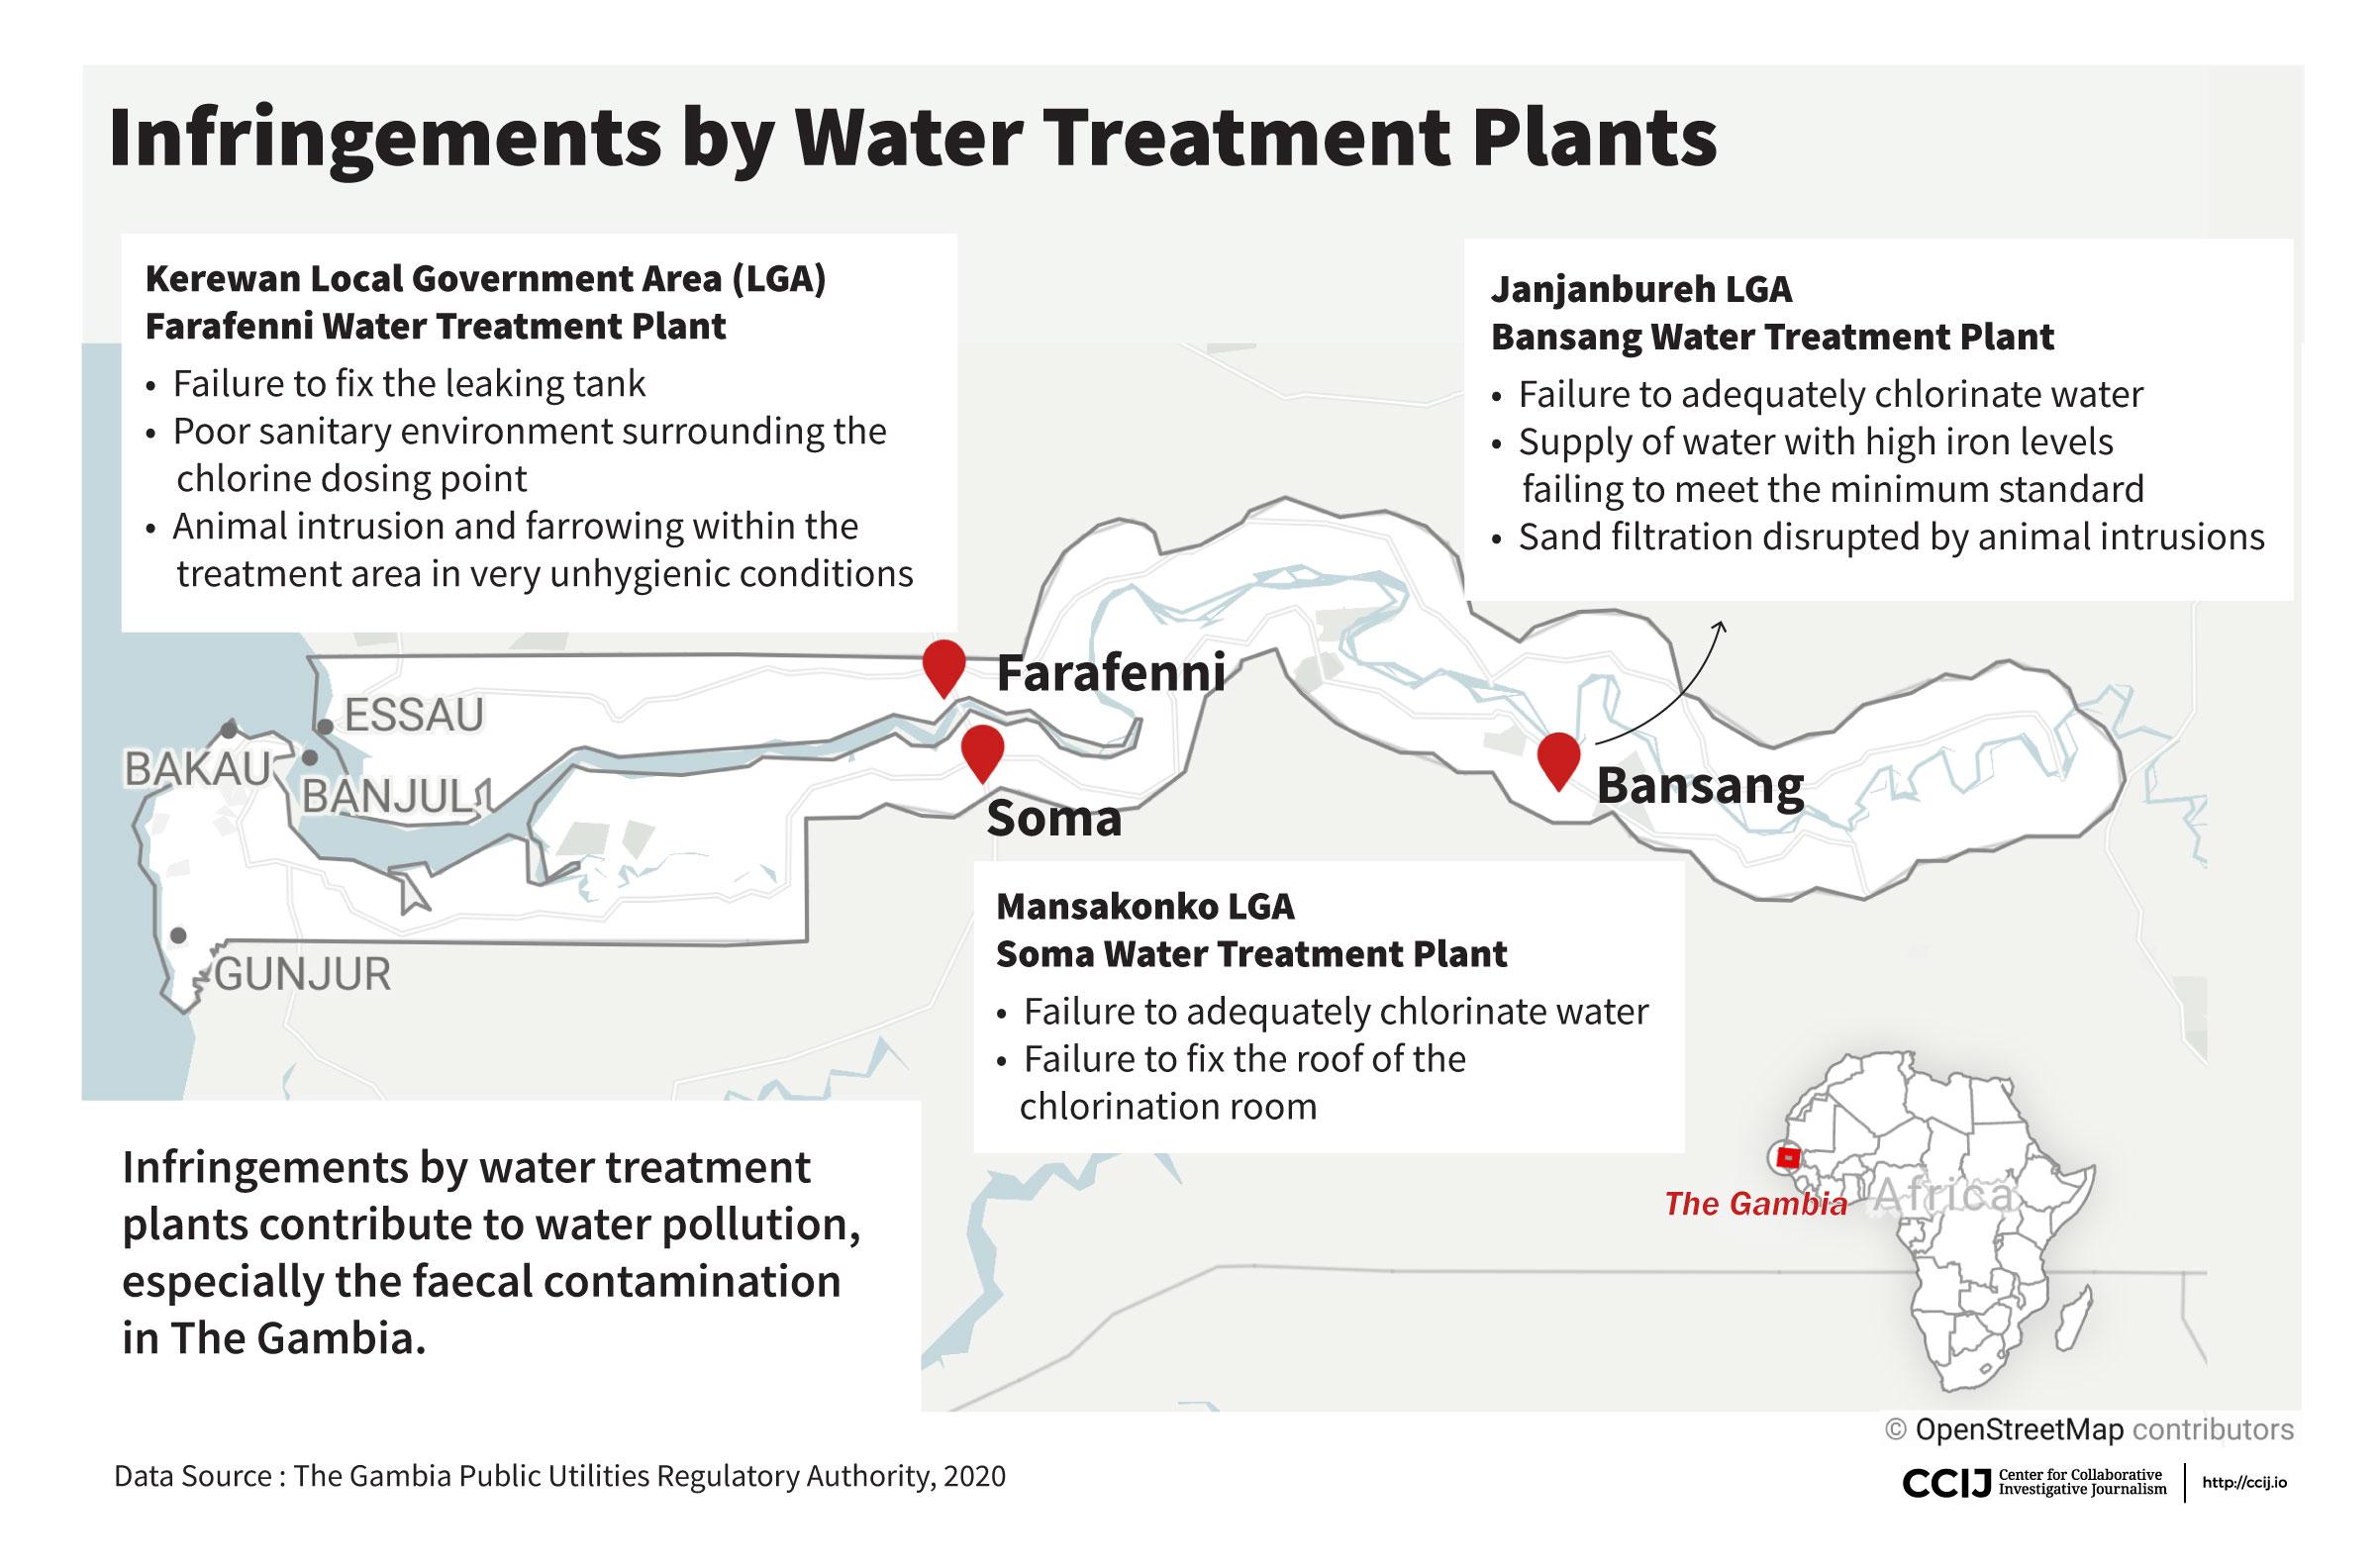 Infringement by water treatment plants